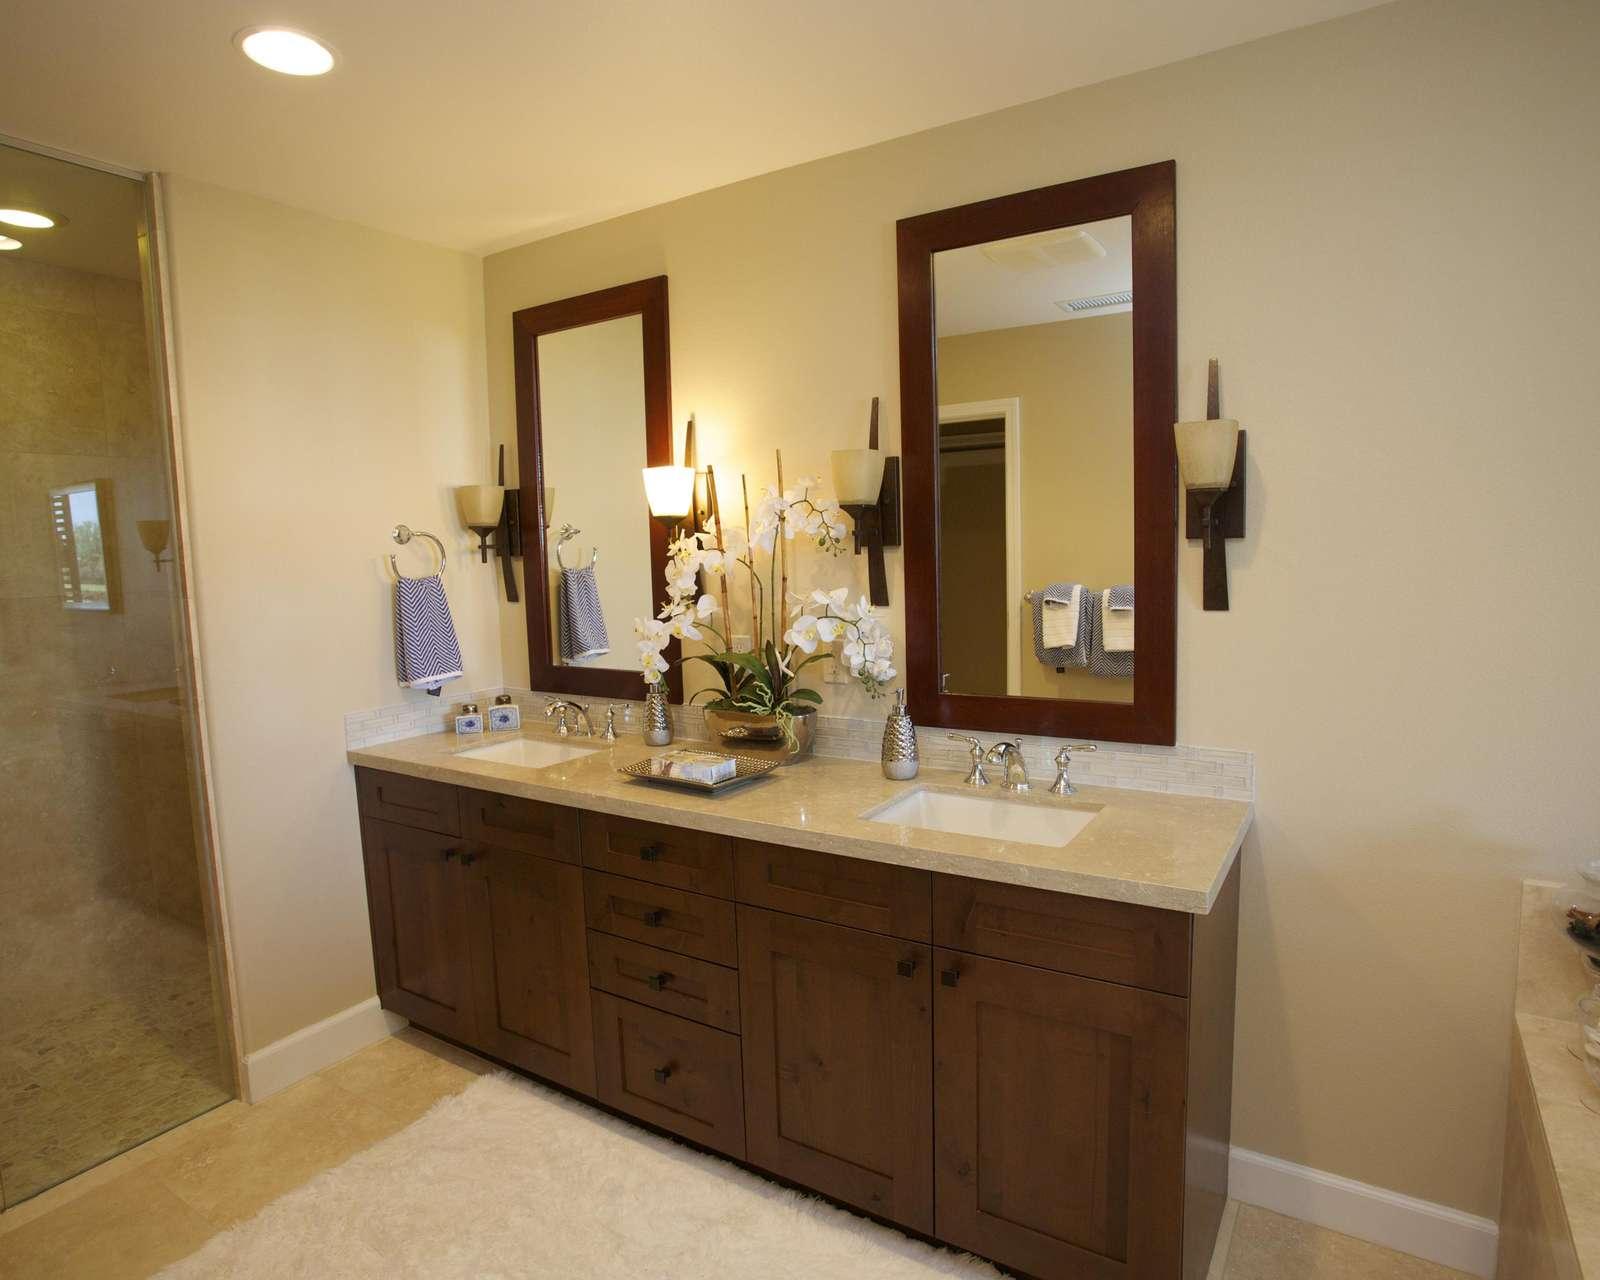 Master bedroom ensuite double vanity